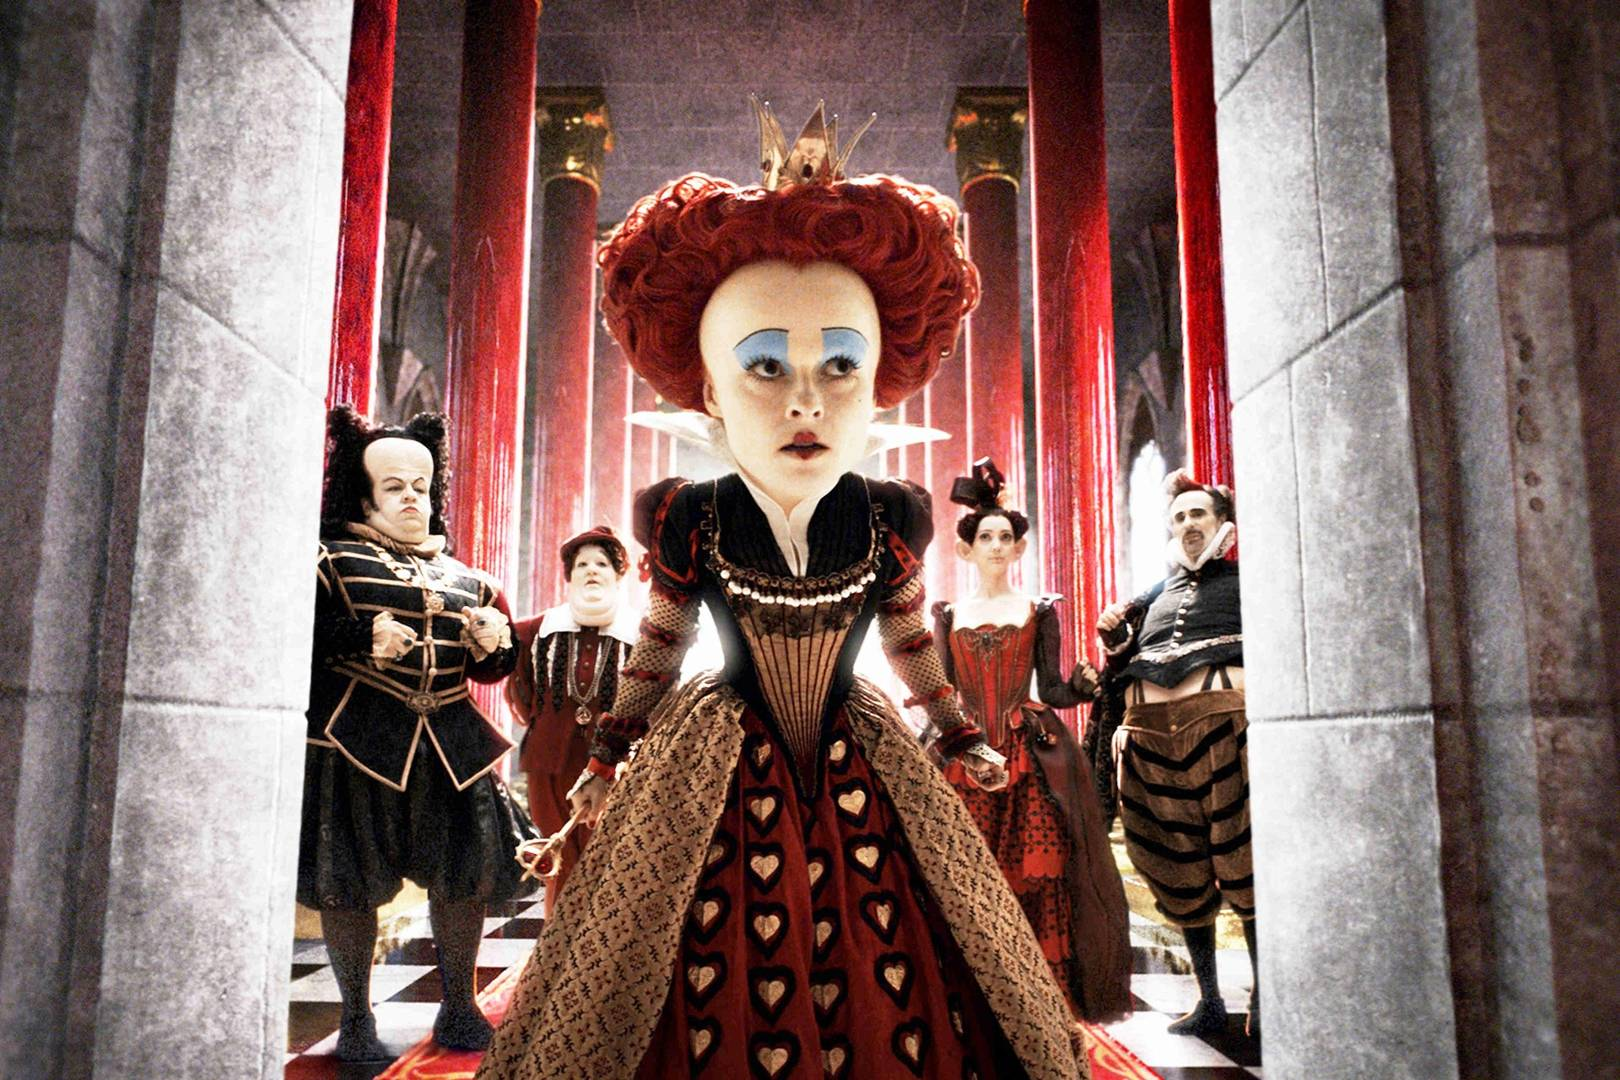 Disney Villain Halloween Costumes Diy.Disney Villains Costume Ideas Halloween Disney Movies Glamour Uk